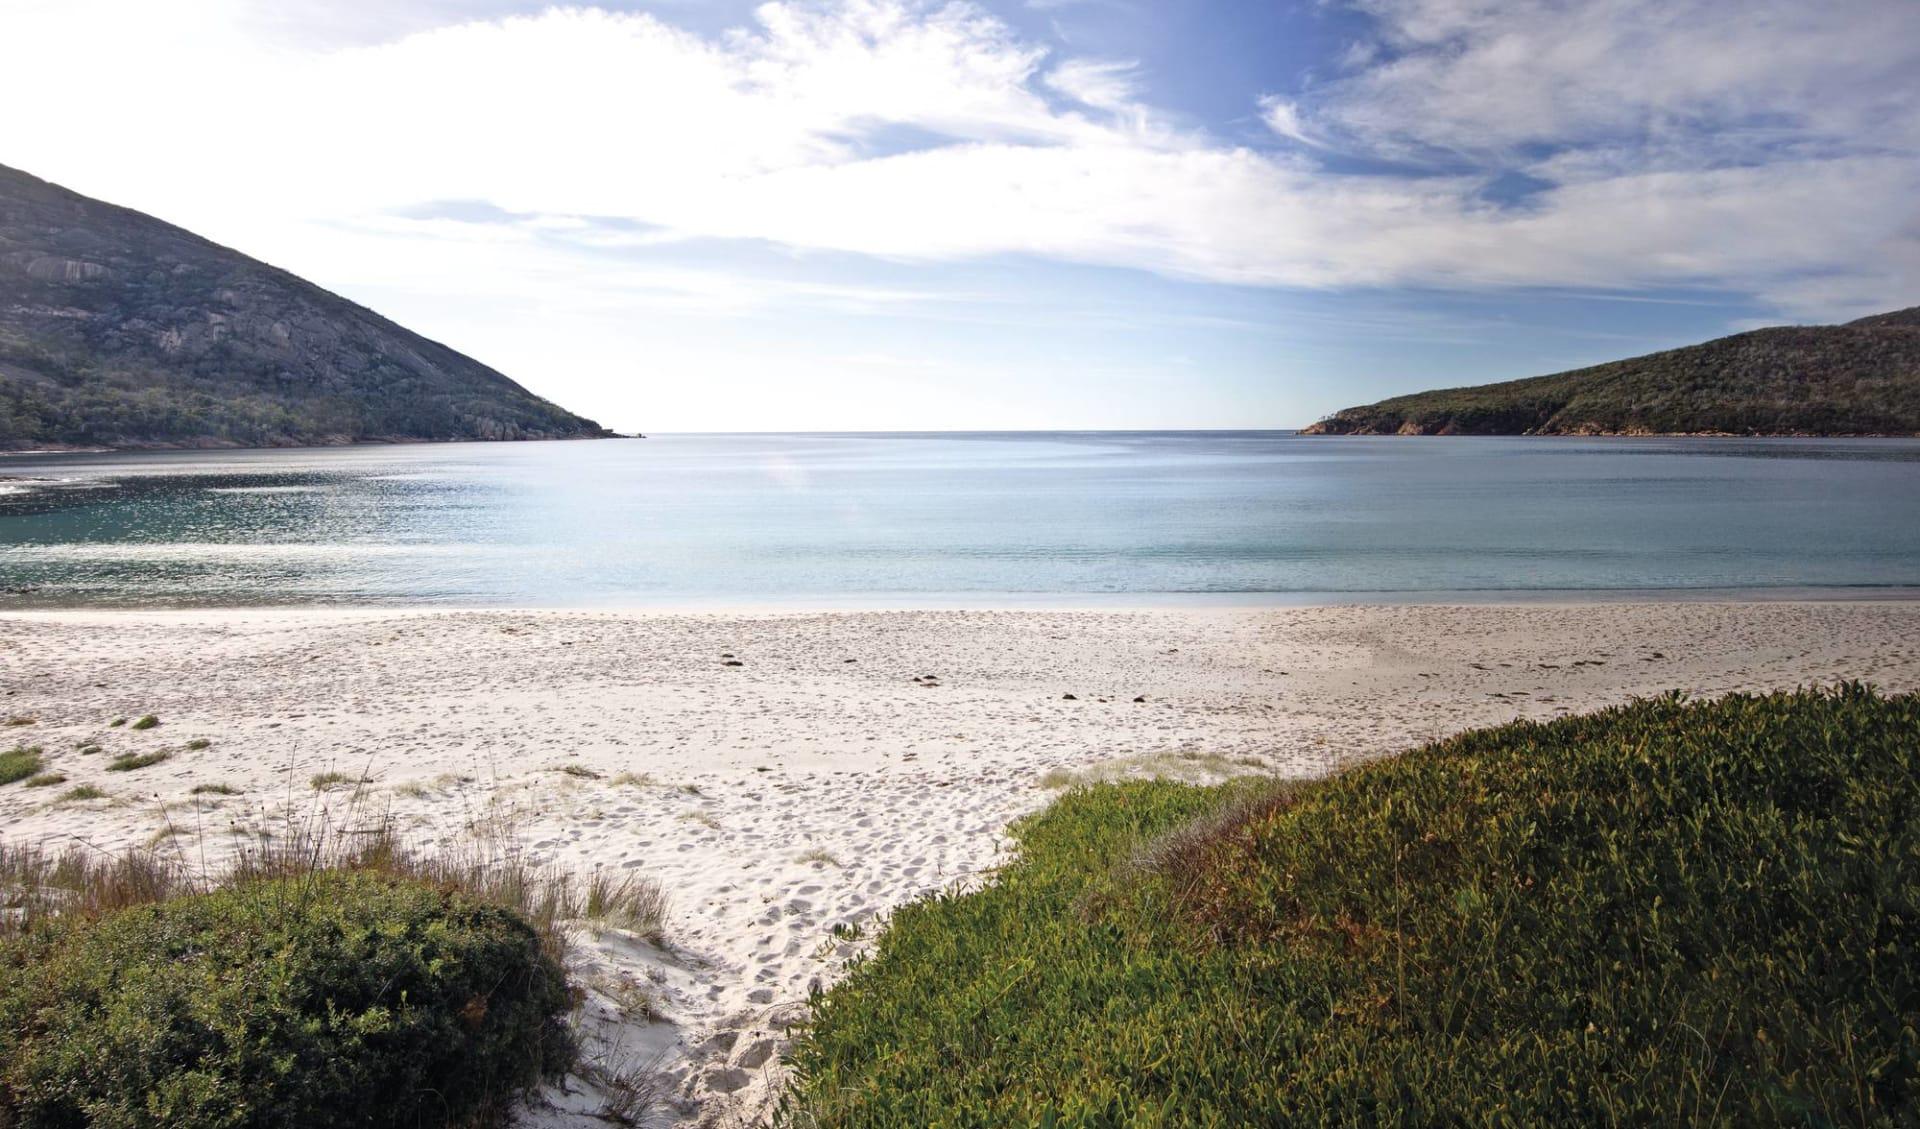 Australian Dream ab Adelaide: Australia - Tasmania - Freycinet NP - Sandstrand